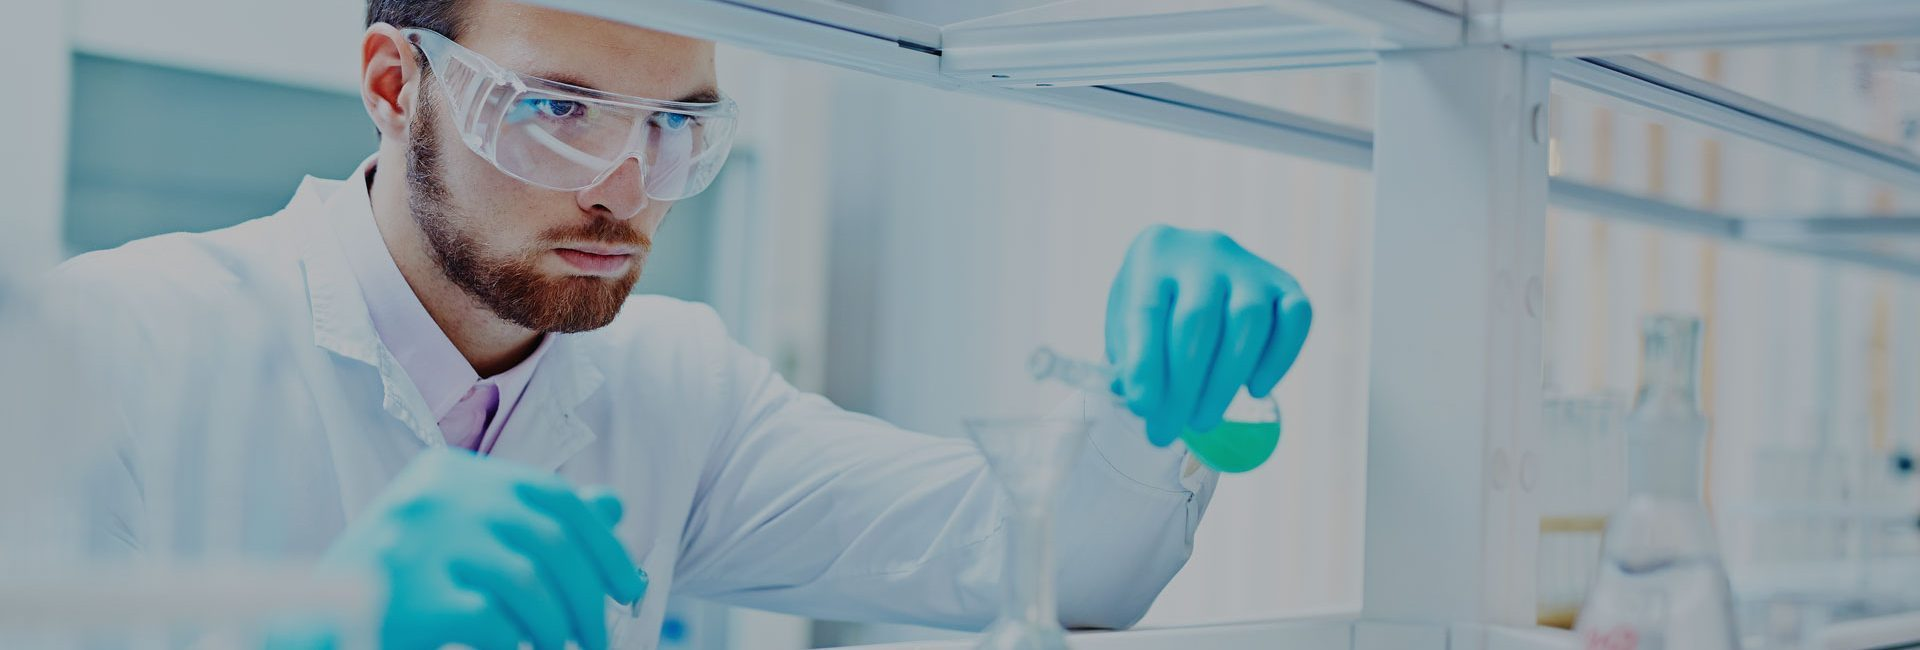 Laboratory Priority Services